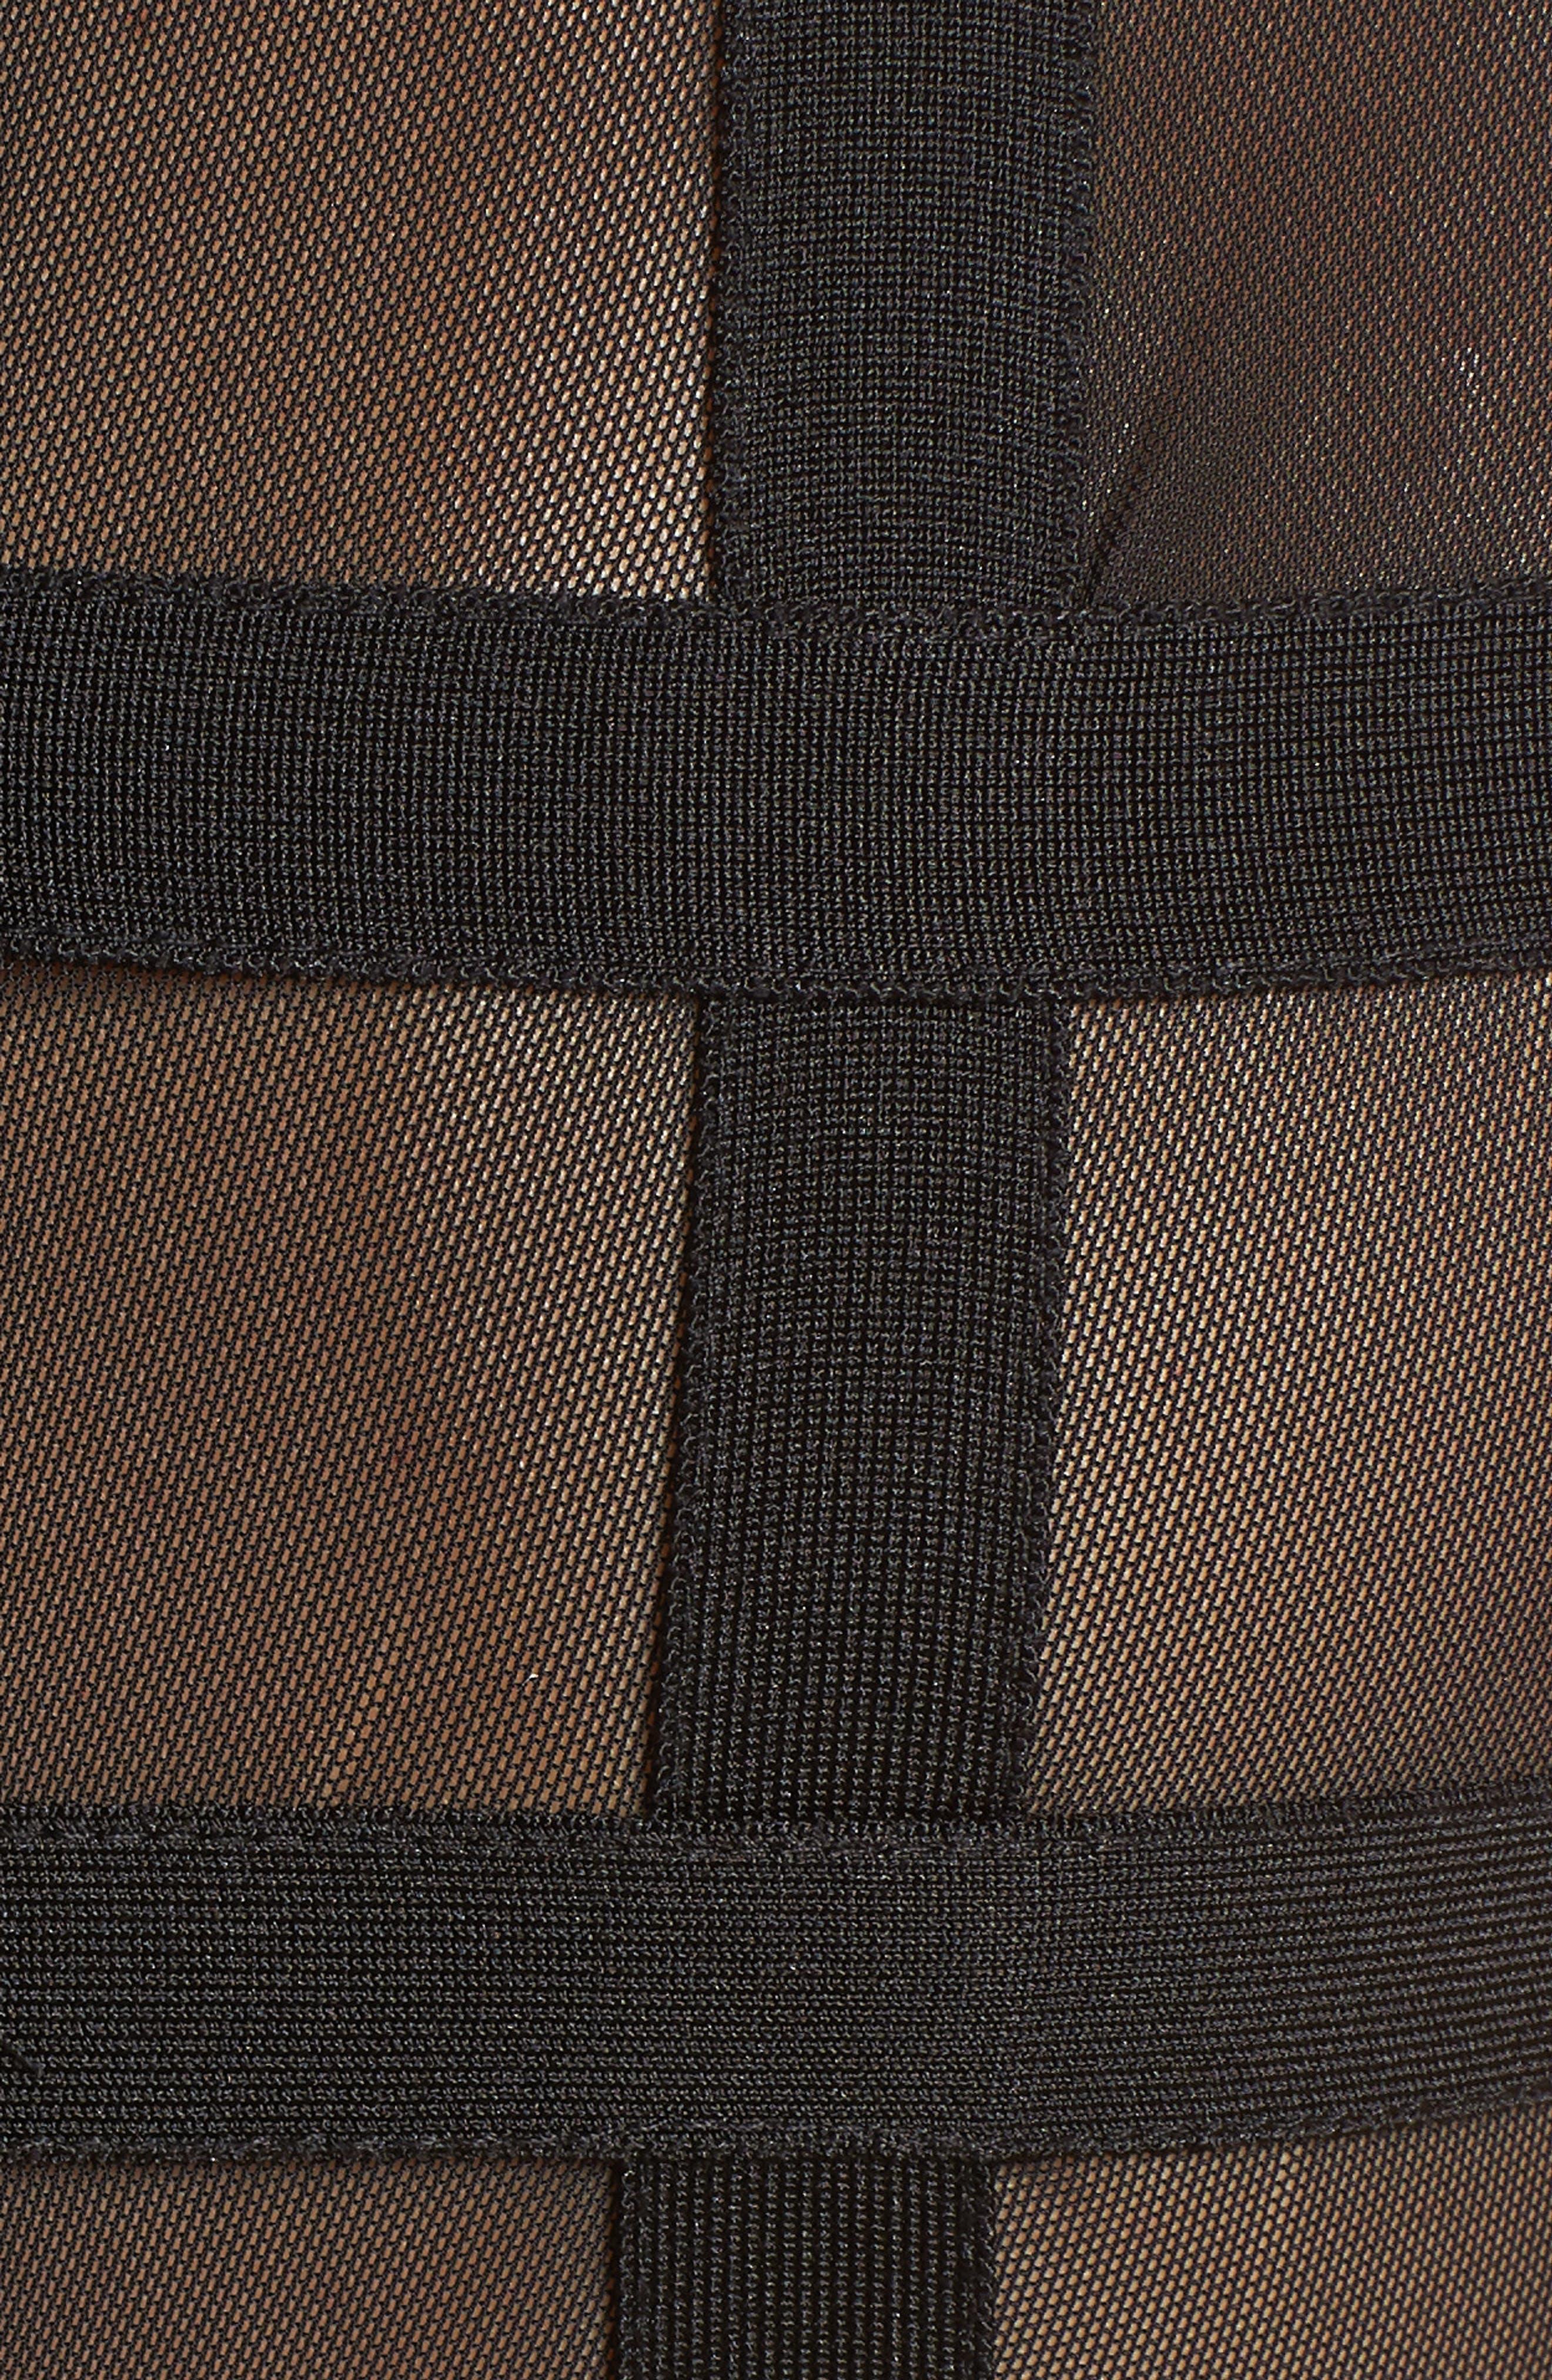 Cagebird Two-Piece Body-Con Dress,                             Alternate thumbnail 5, color,                             BLACK